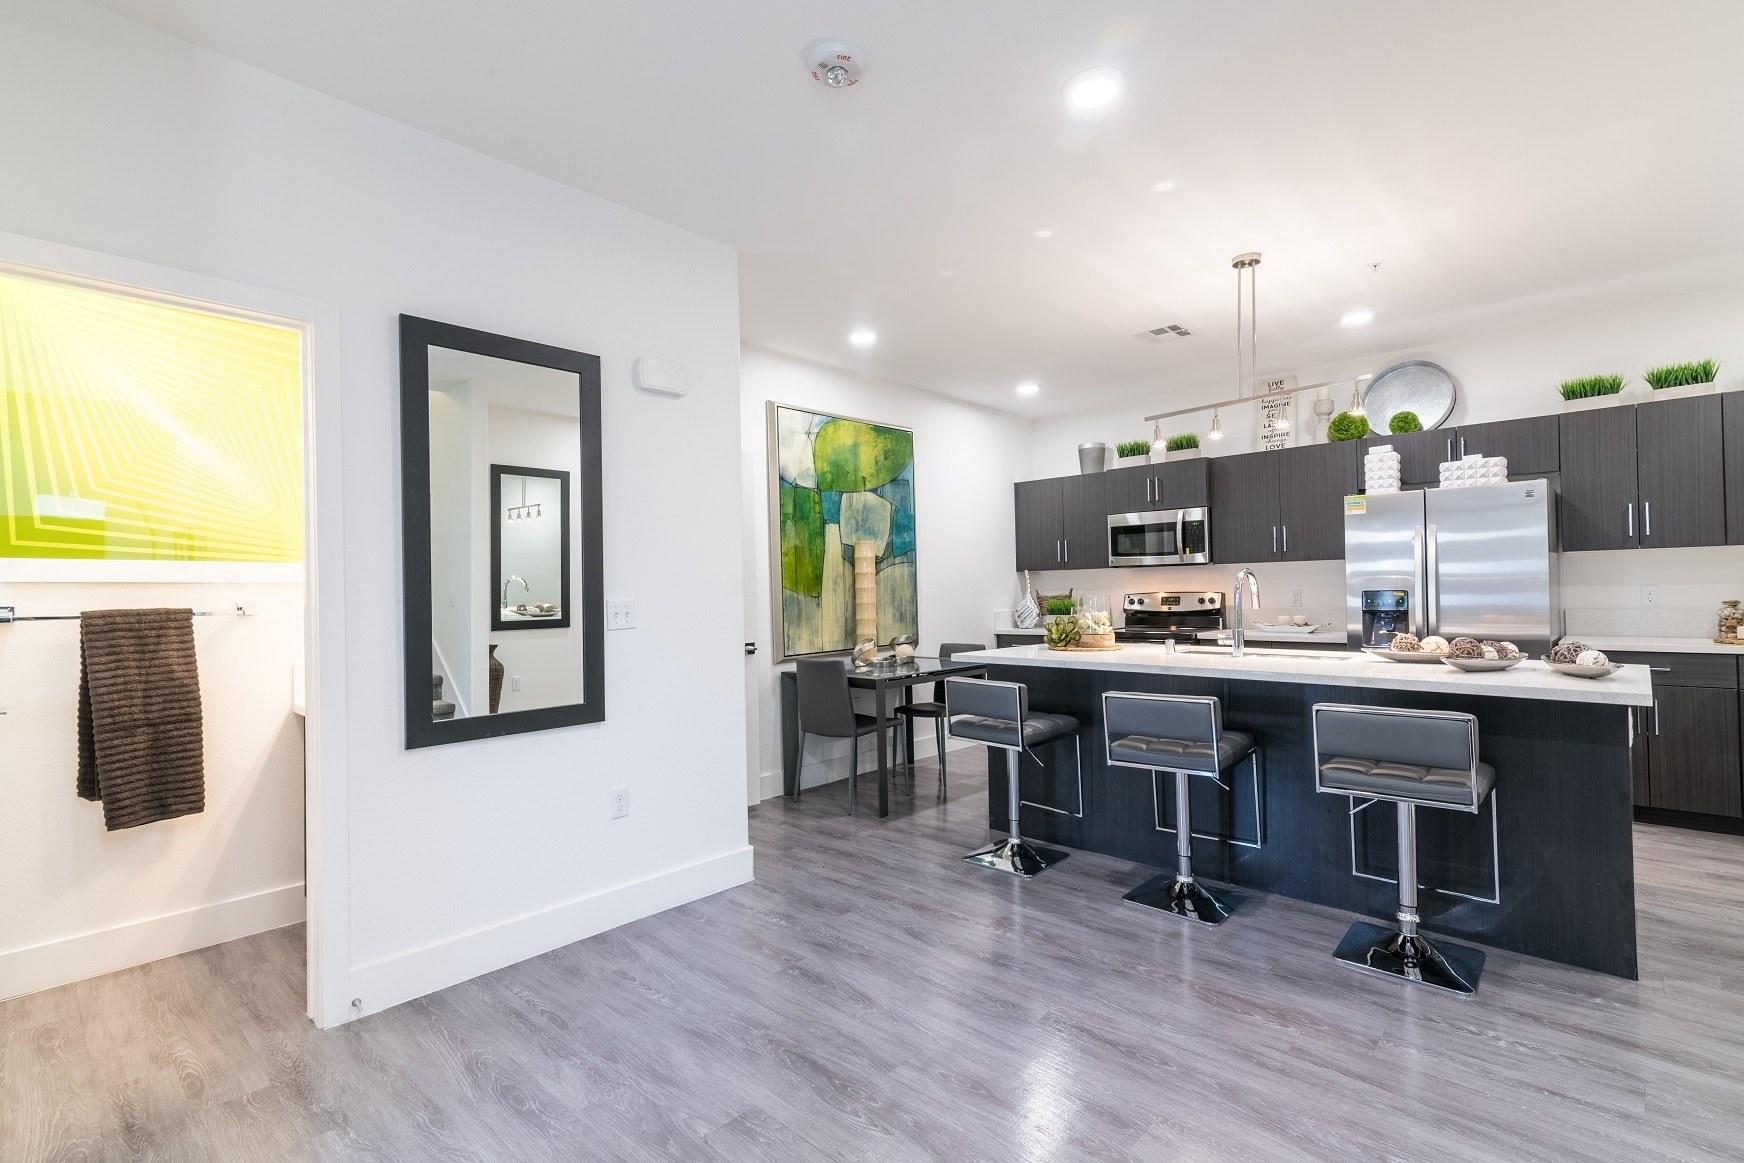 Photos Of Evo Apartments In Las Vegas Nv